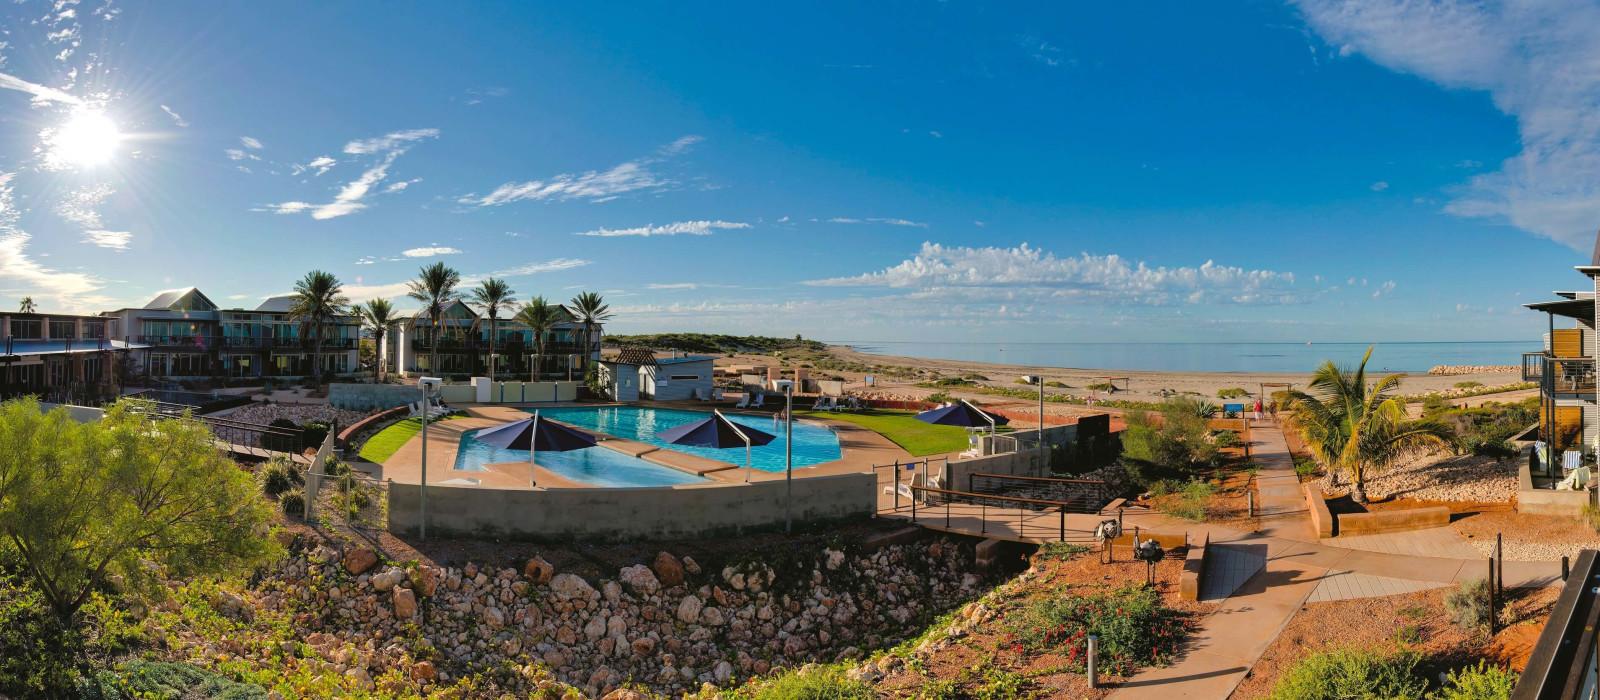 Hotel Mantarays Ningaloo Resort Exmouth Australia